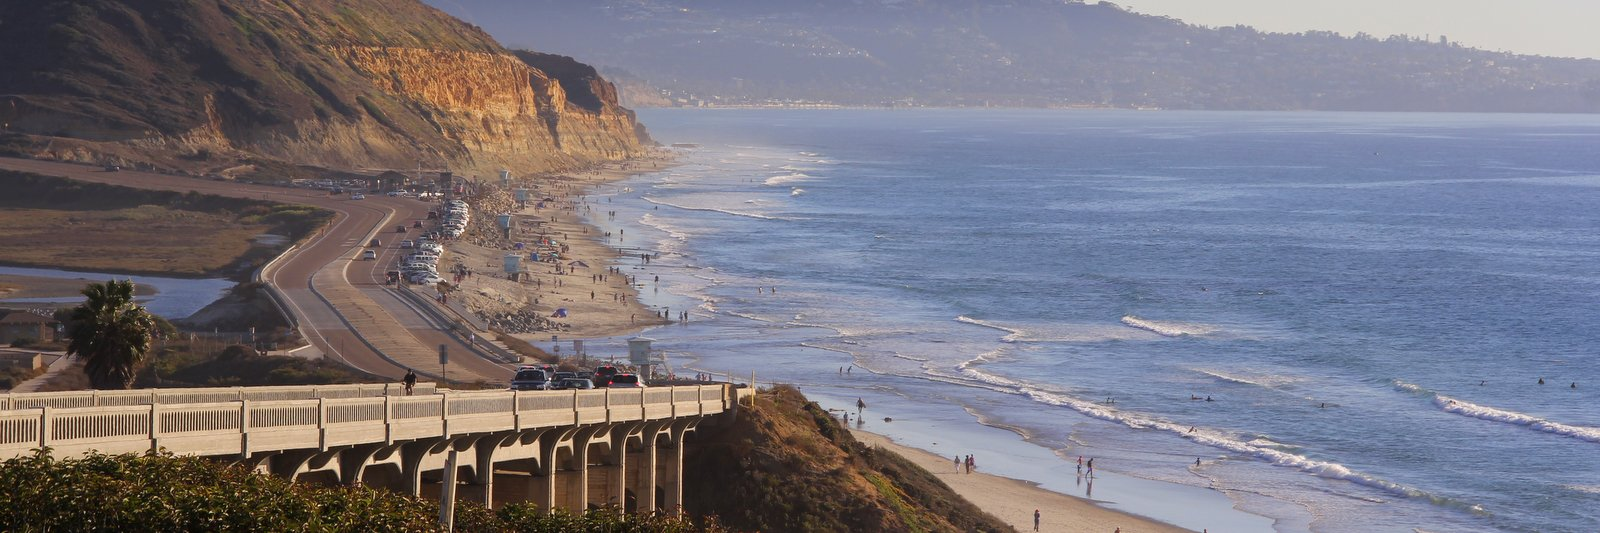 San_Diego_California_photo_2733